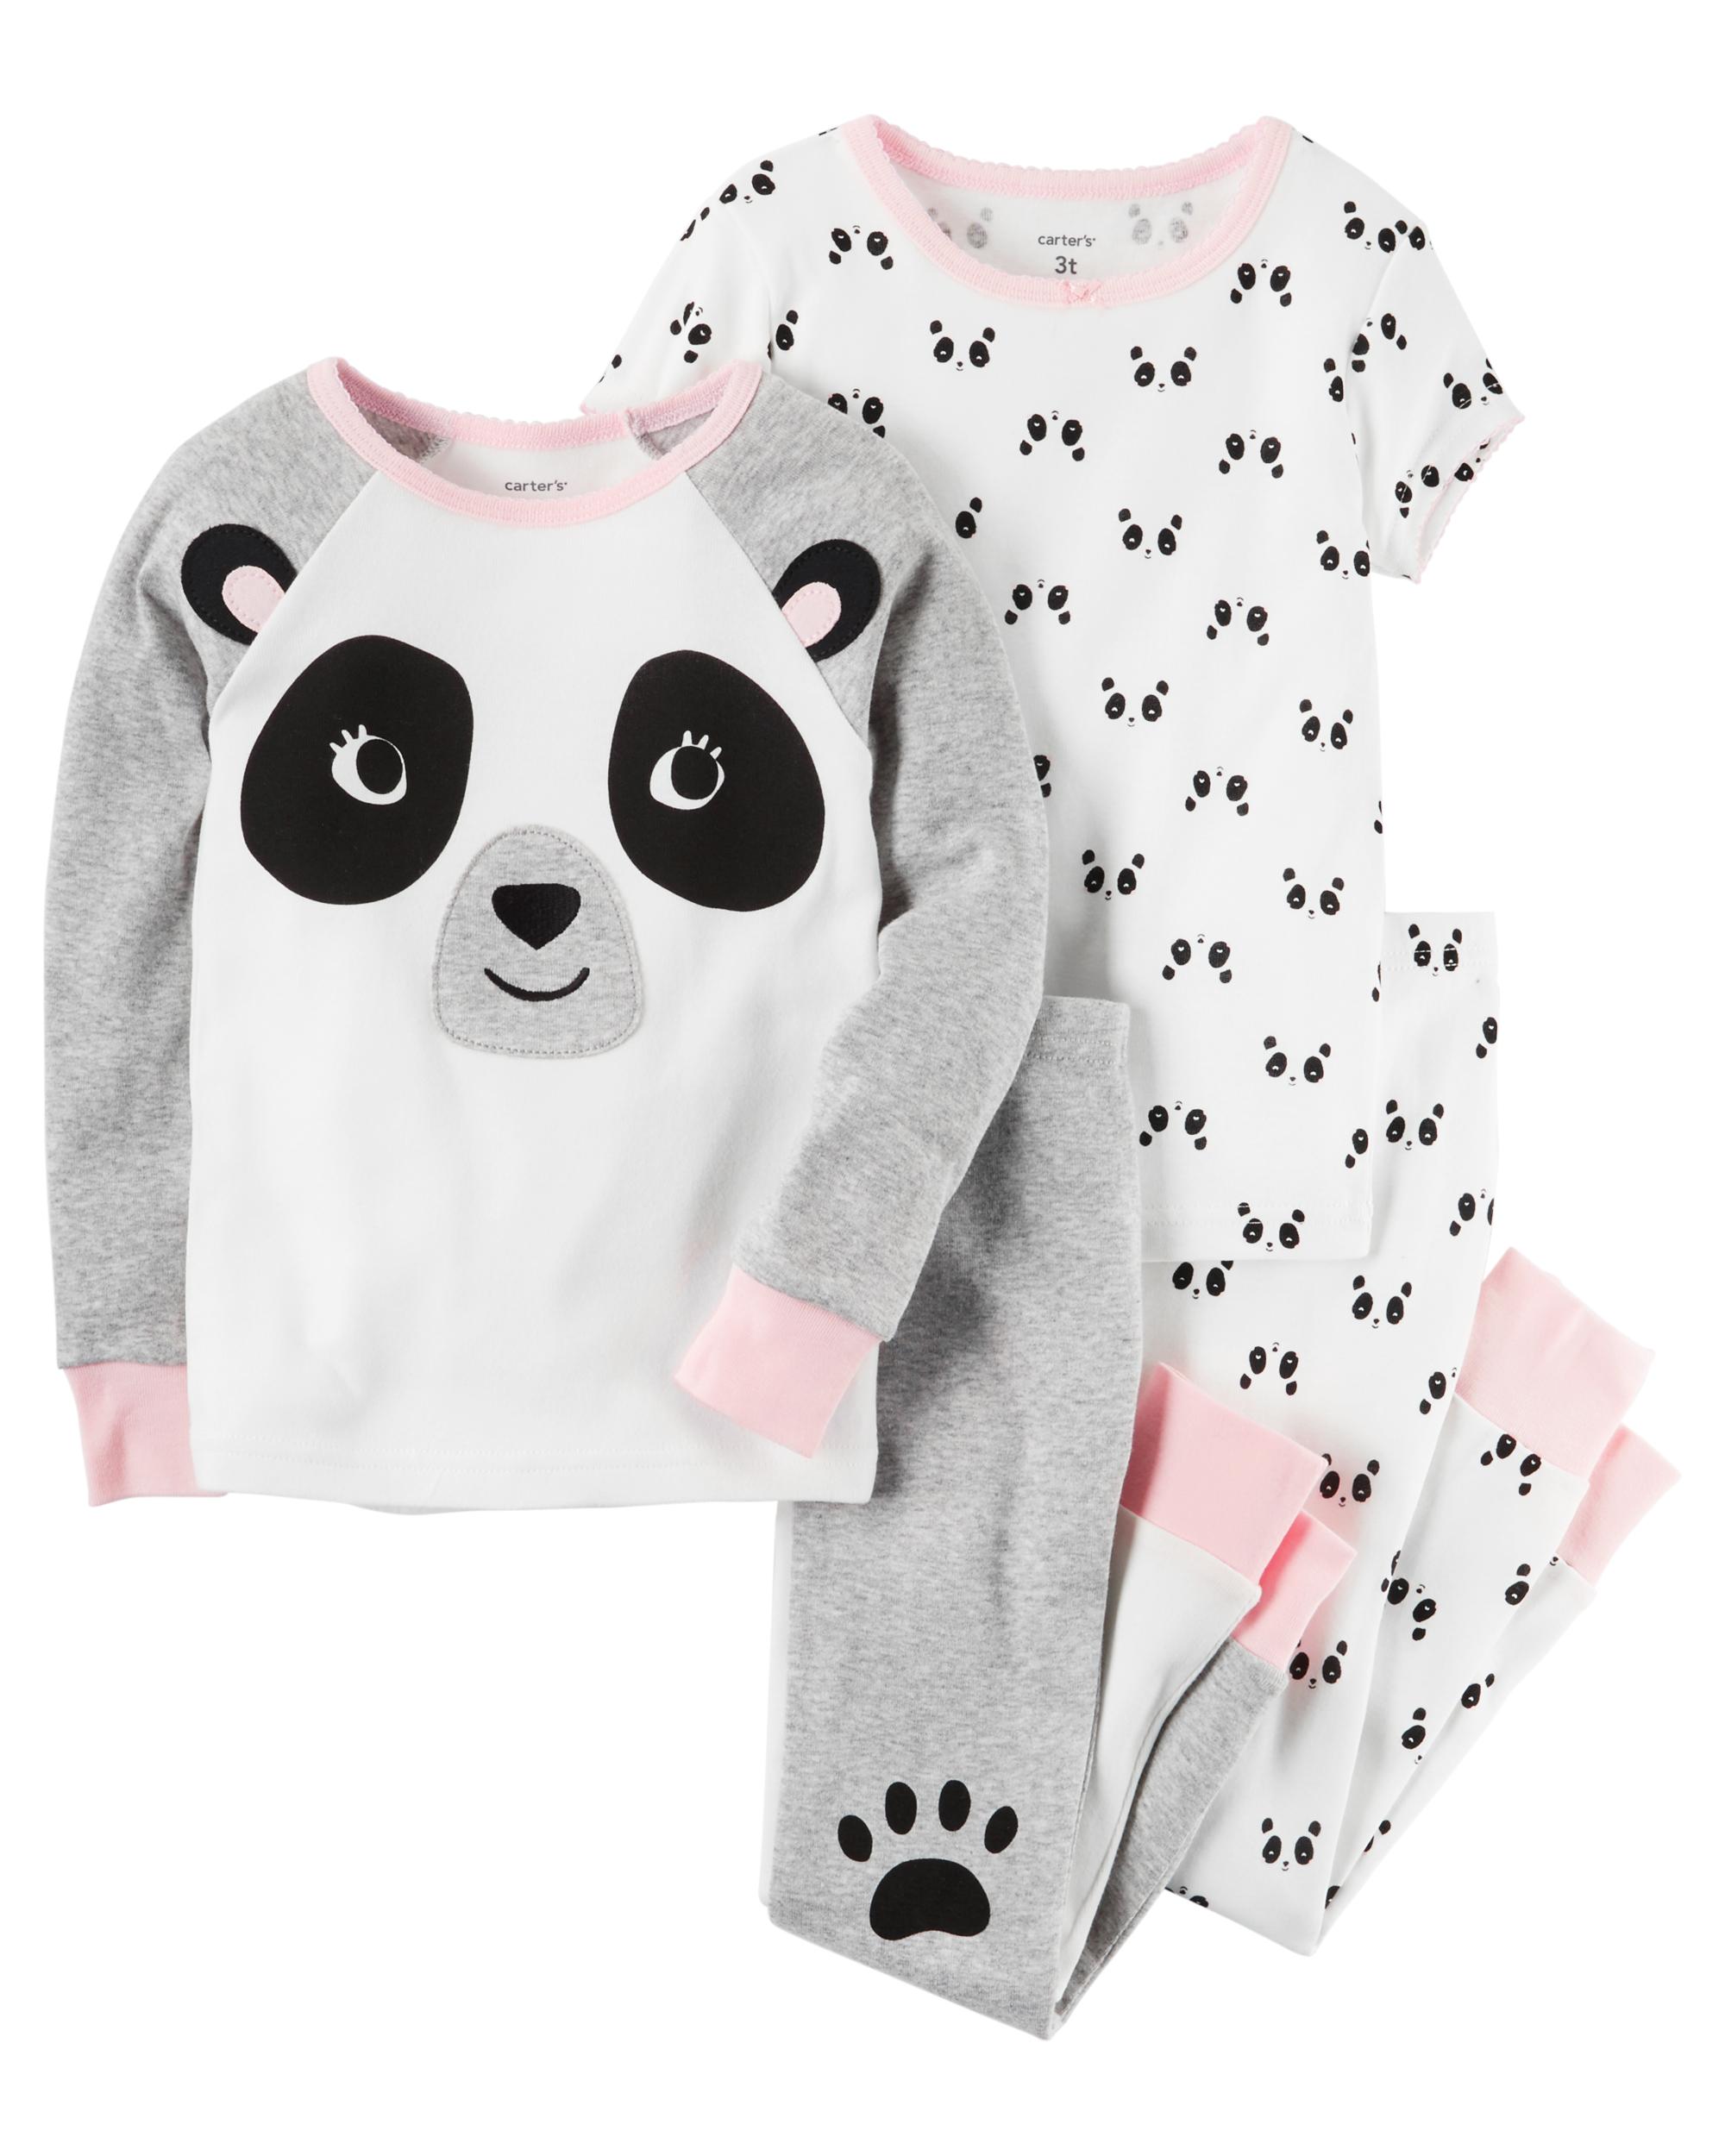 c8510fc2b66 4-Piece Panda Snug Fit Cotton PJs   carters.com